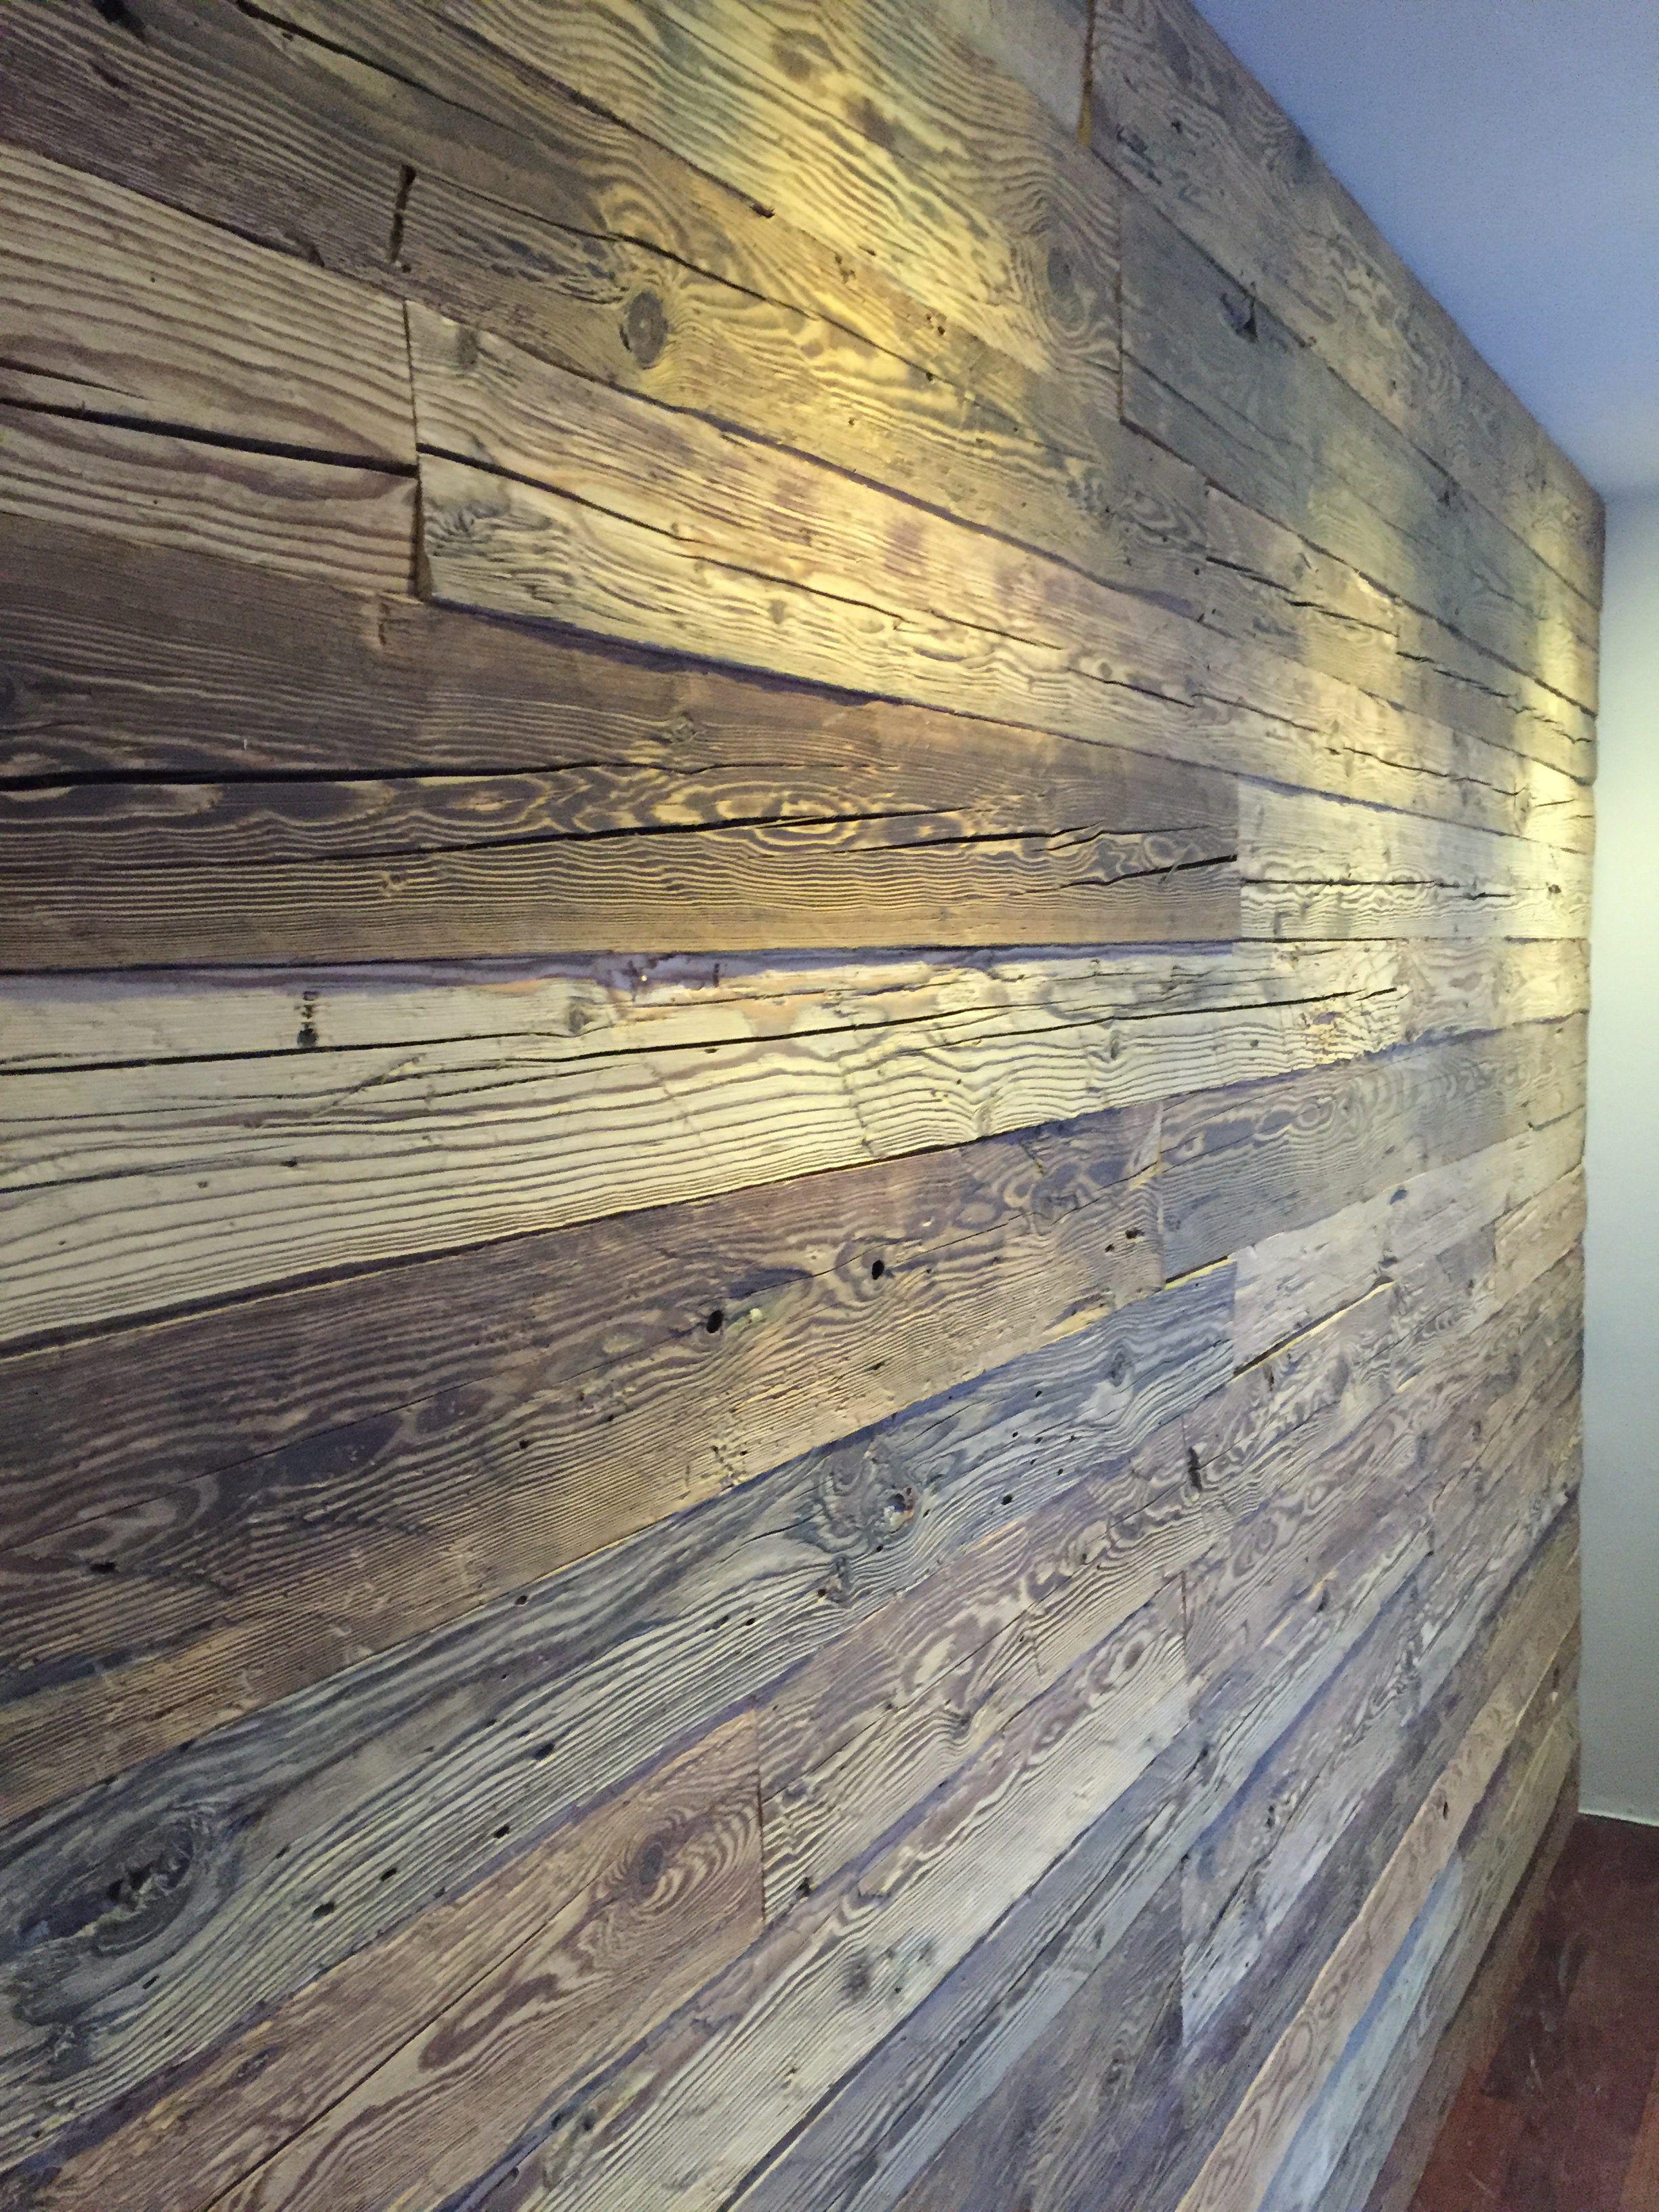 Montage Holz Wandverkleidung Wandverkleidung Wandpaneele Holz Wanddekoration Holz